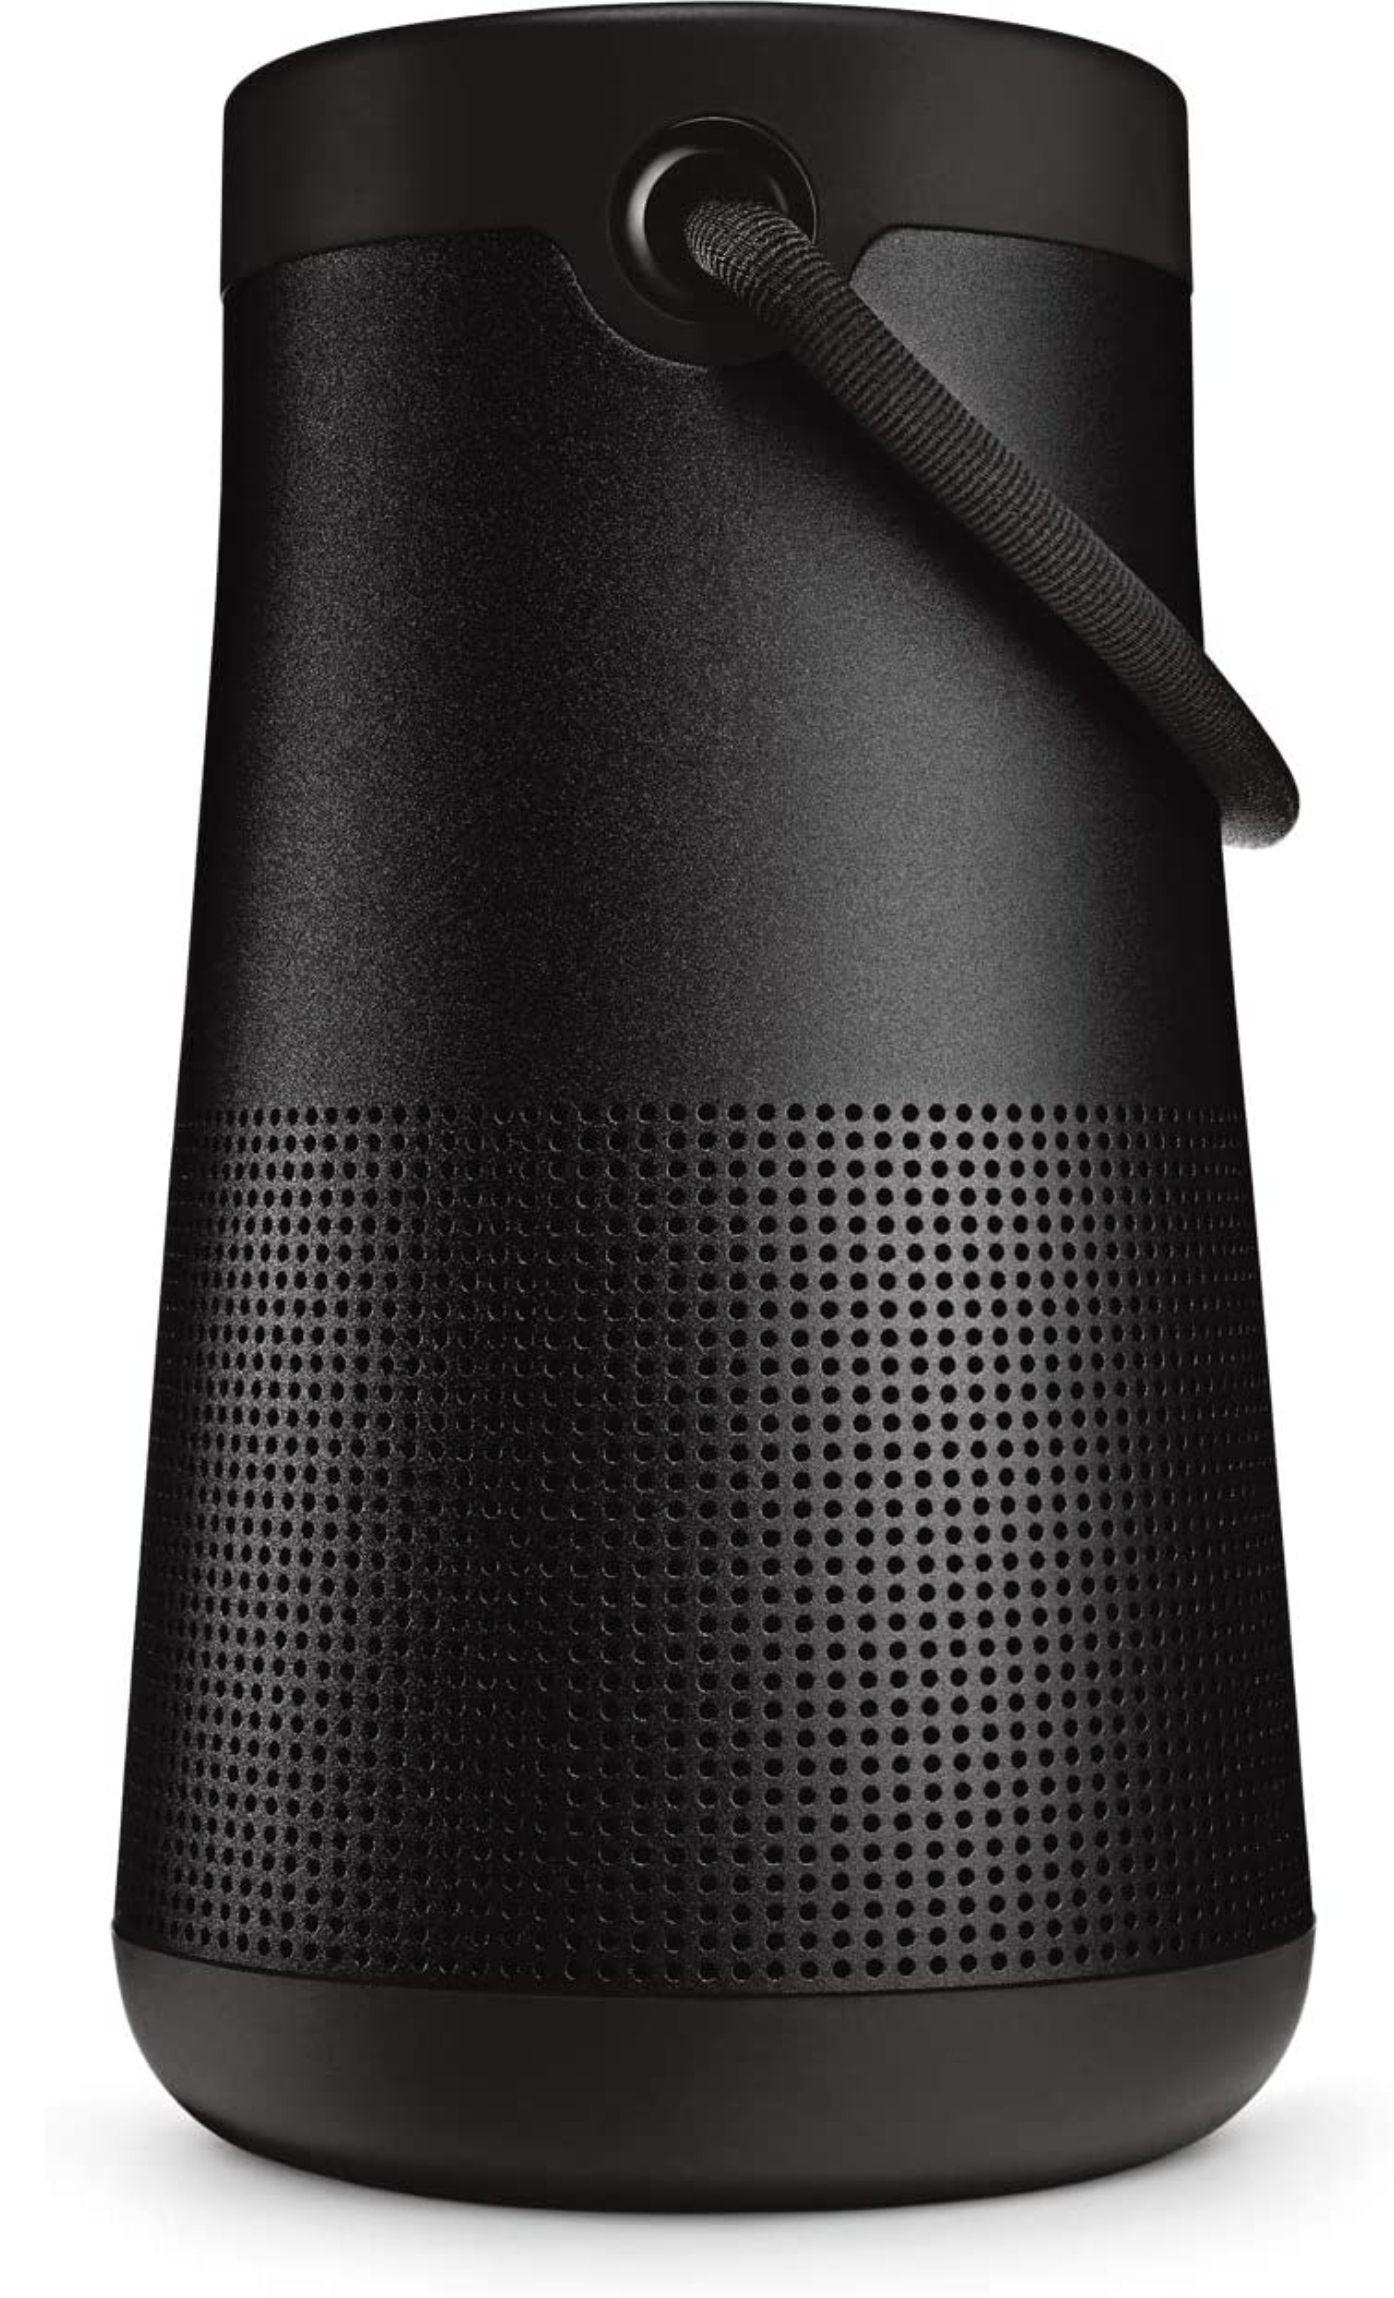 Enceinte Bluetooth Bose Soundlink Revolve+ Séries ll - Noir